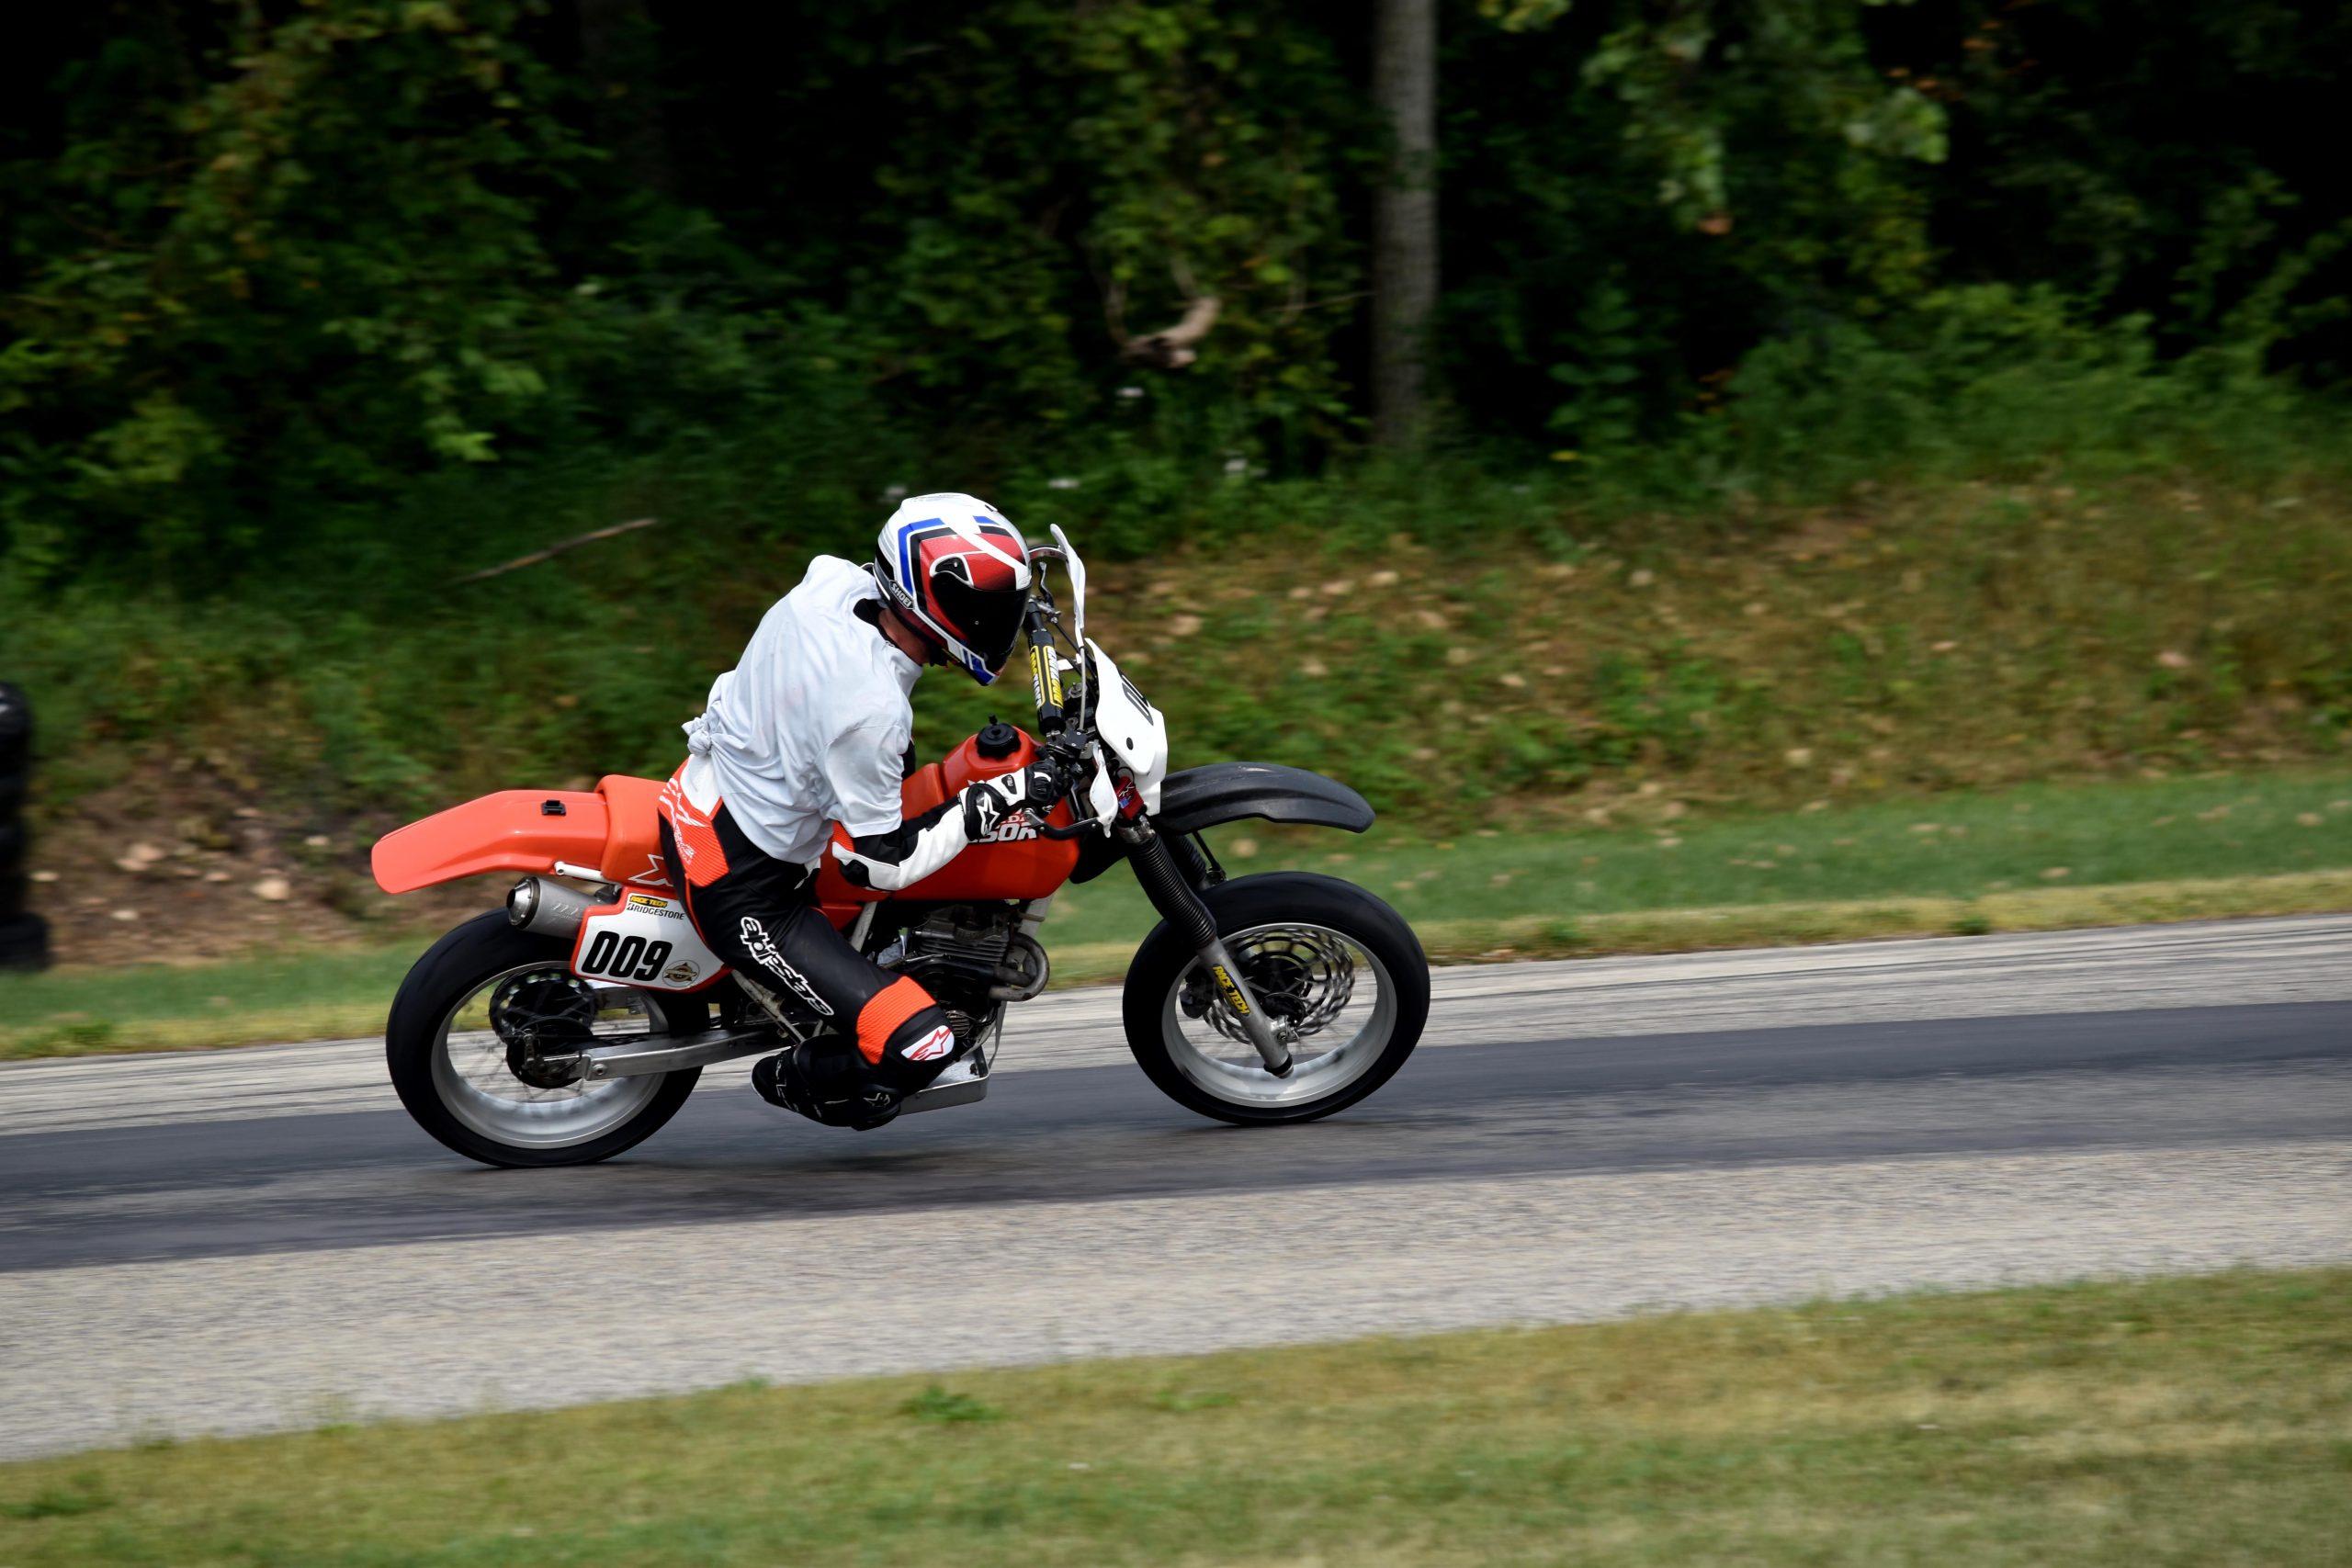 Honda XR250 on track Blackhawk Farms 3